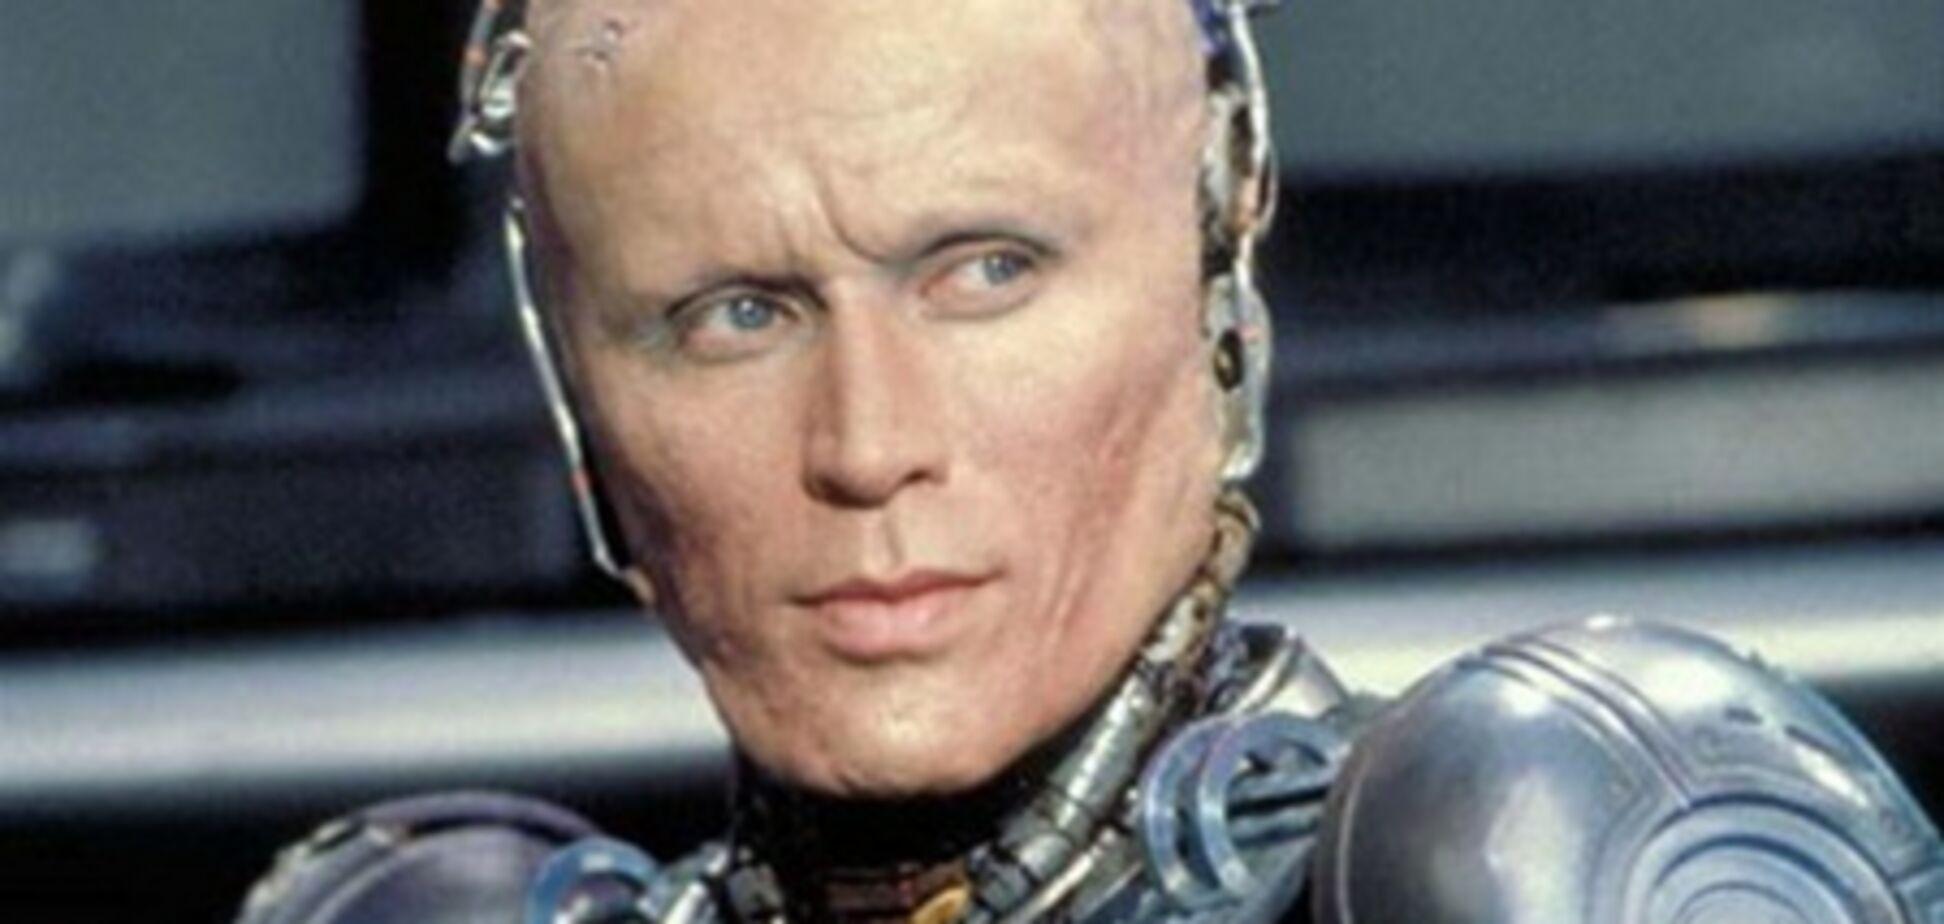 Робокоп появится в «Звездном пути 2»